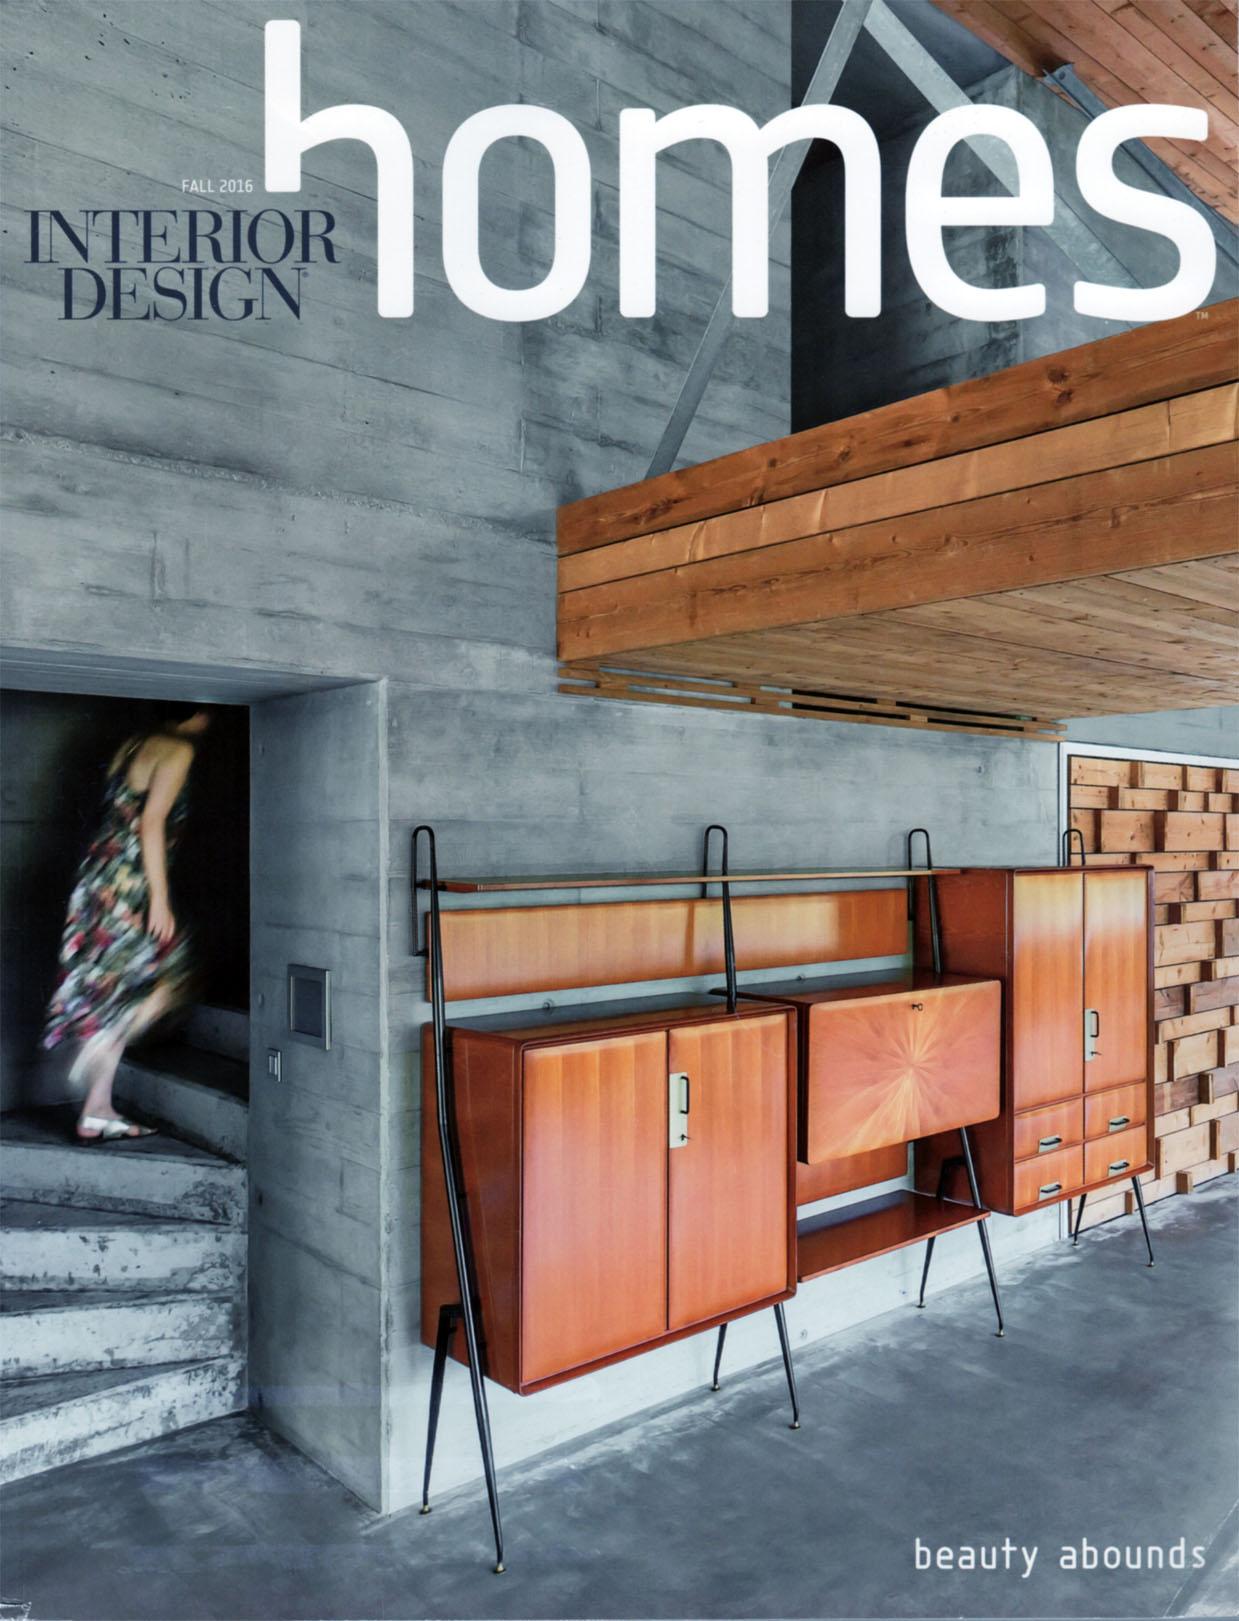 Interior Design Homes Fall 2016 DXV Design Panel 2016-2017 Charleston Classic